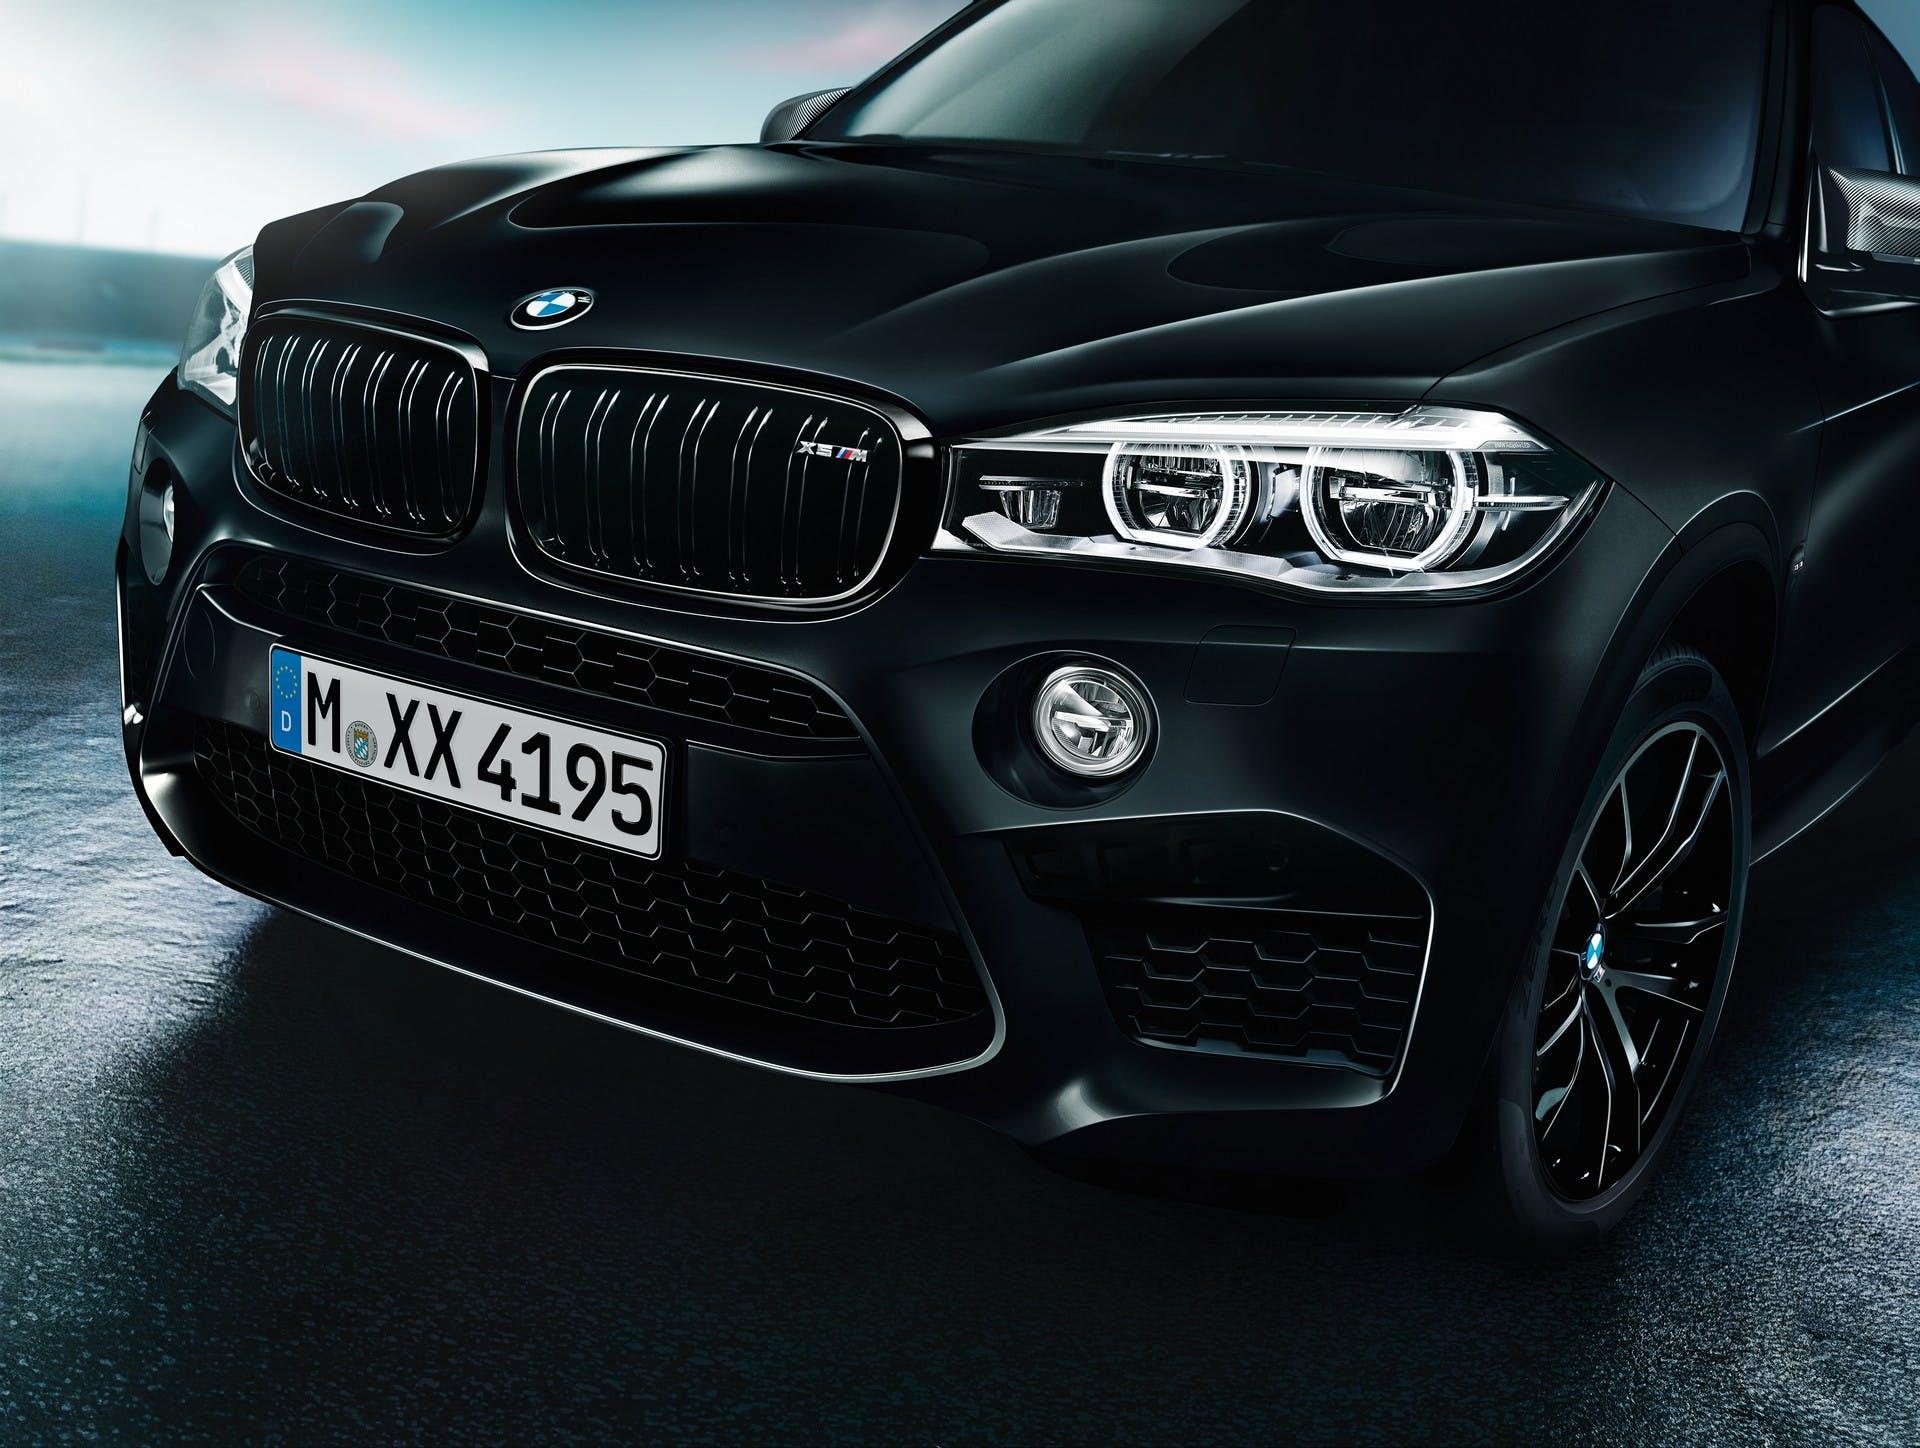 BMW X5 X6 M Black Fire Edition dettaglio